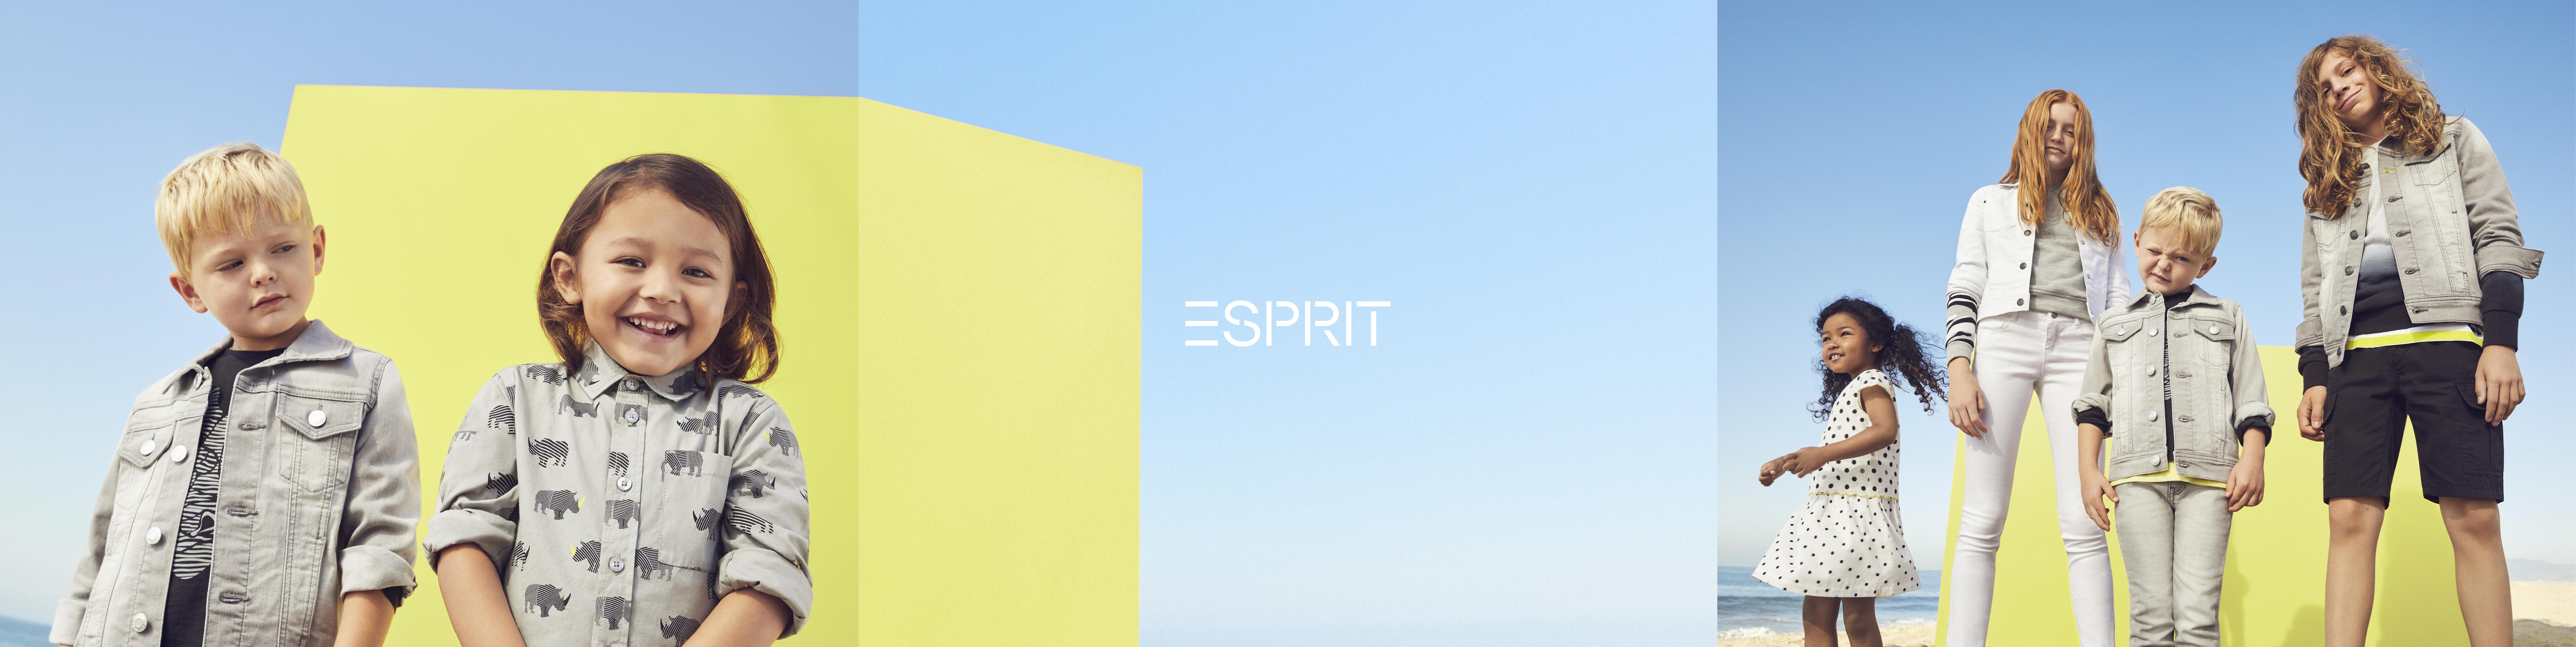 Kinderkleding Zalando.Esprit Kinderkleding Online Kopen Gratis Verzending Zalando